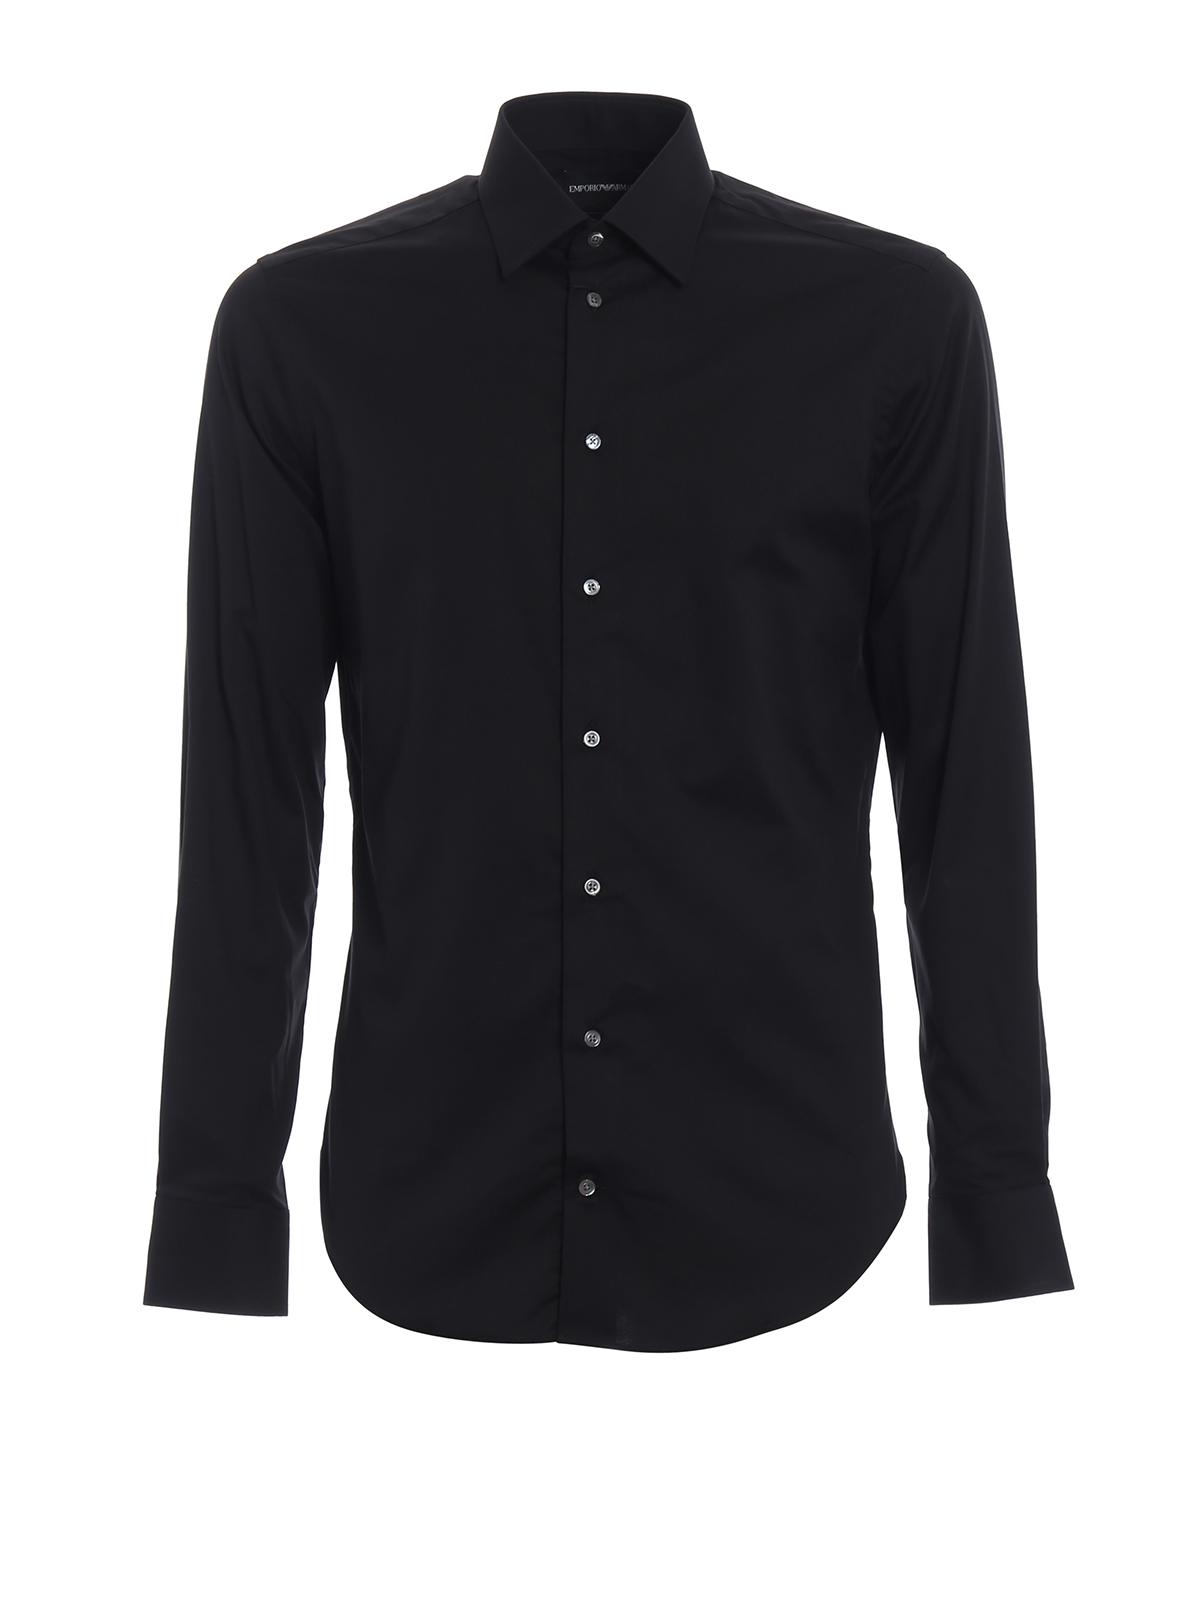 Cotton Poplin Black Slim Fit Shirt By Emporio Armani